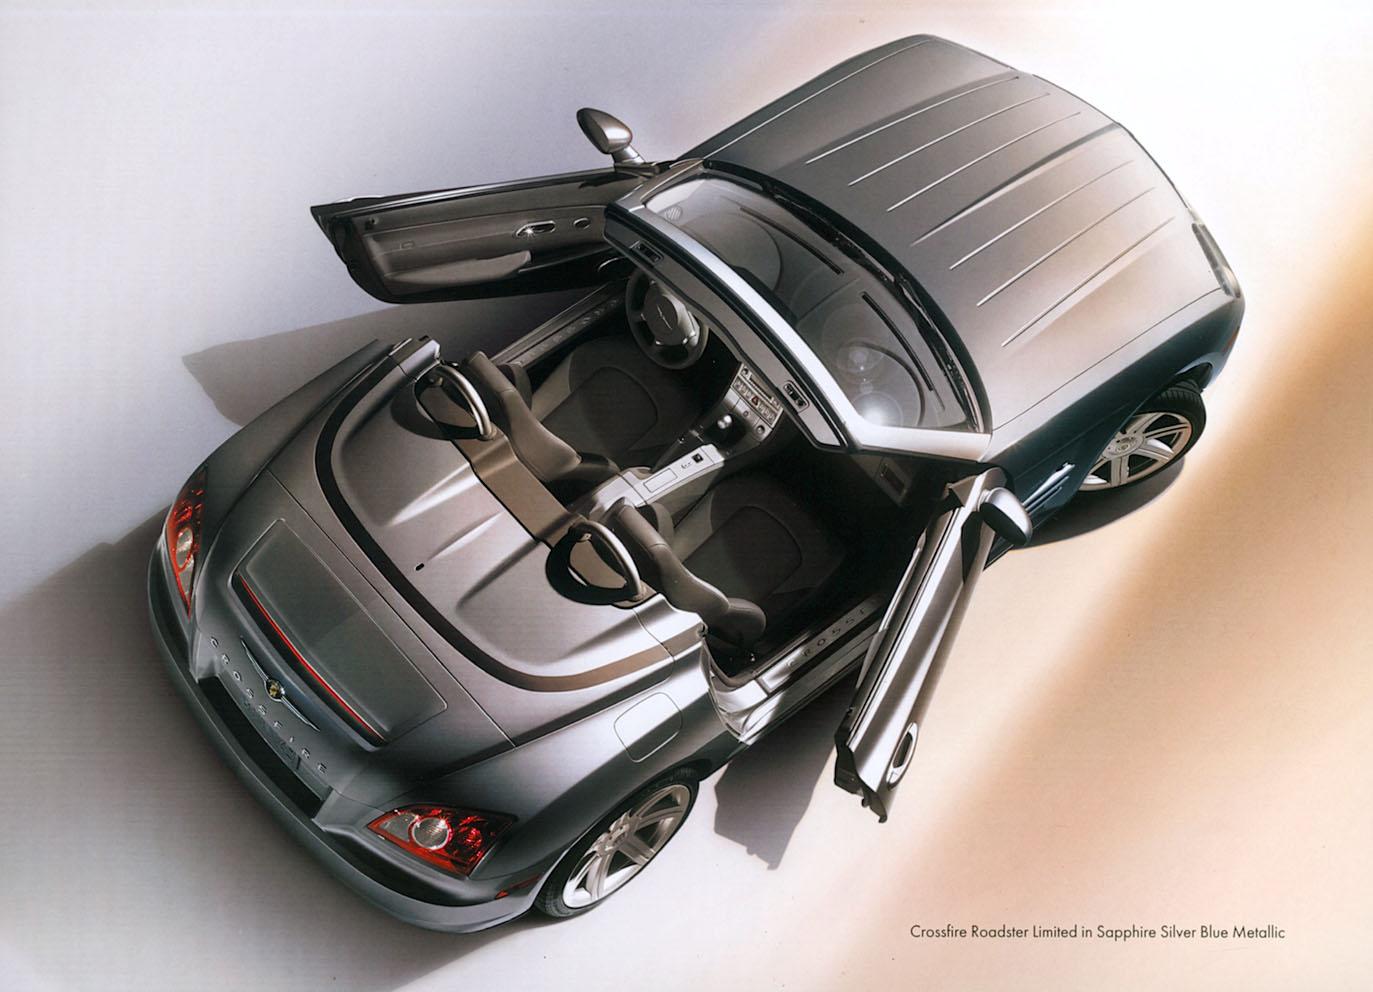 05crfion 2005 Chrysler Crossfire